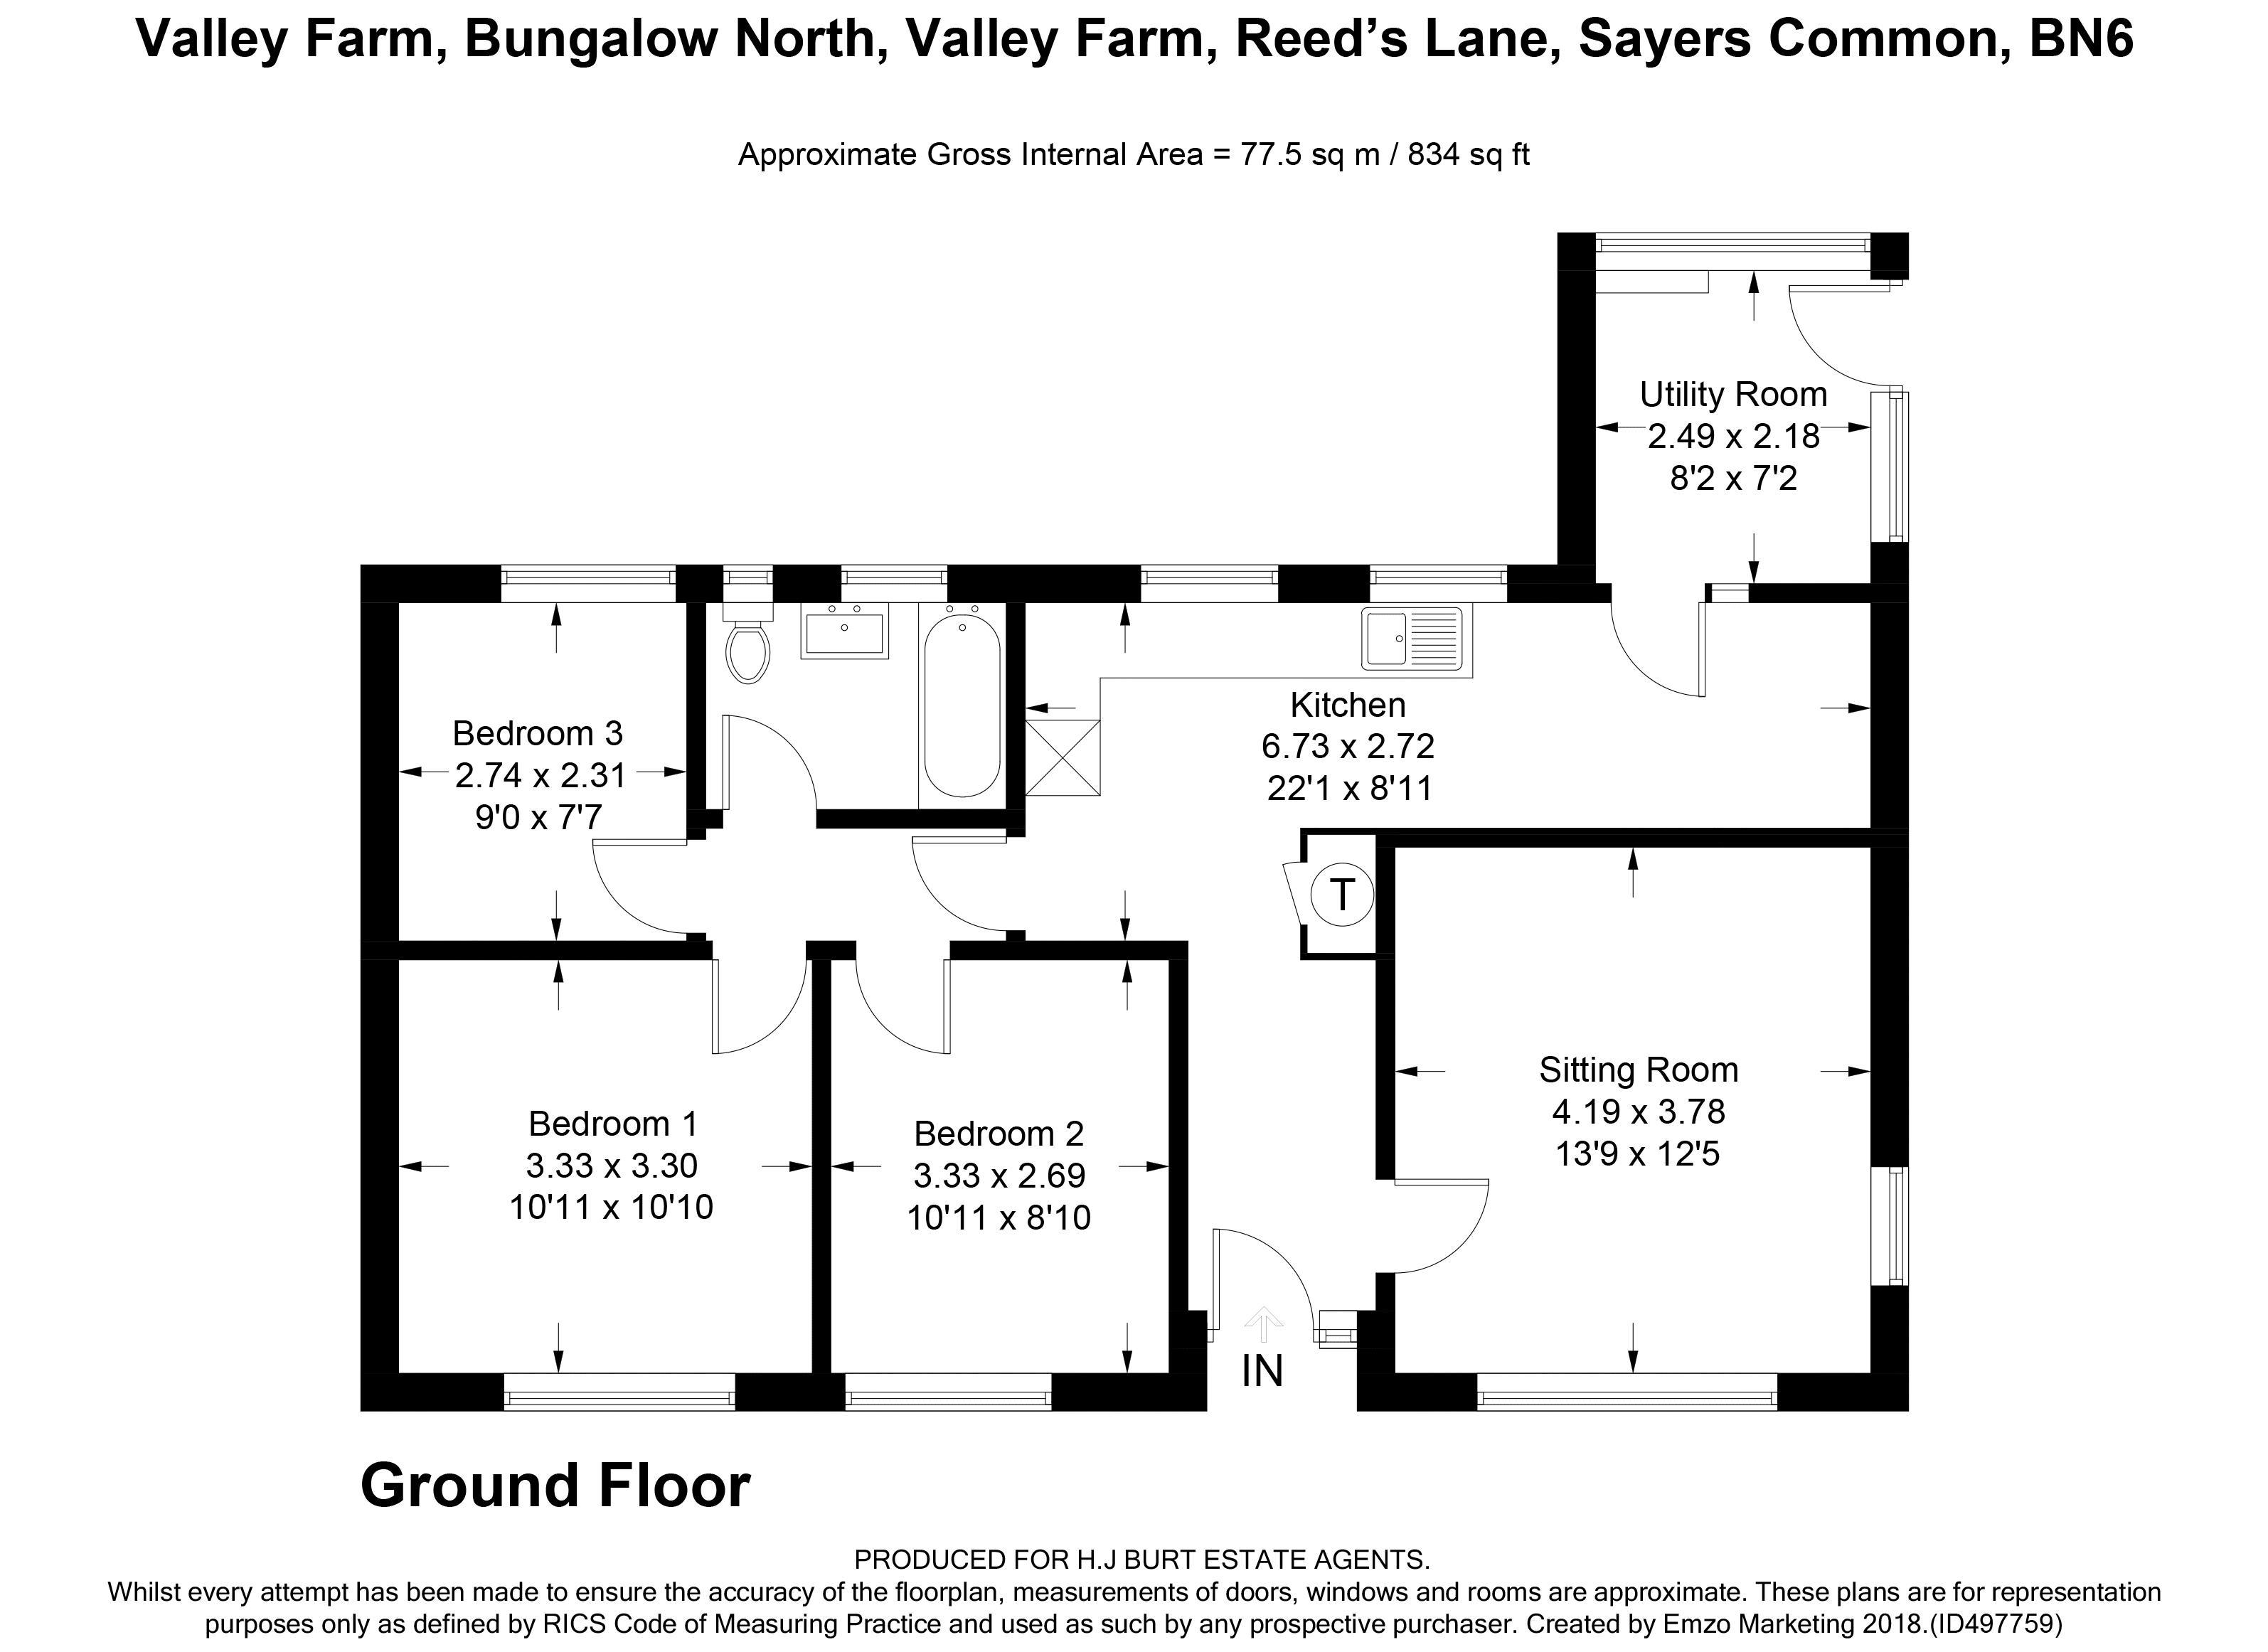 Valley Farm & Business Park, Reeds Lane Sayers Common